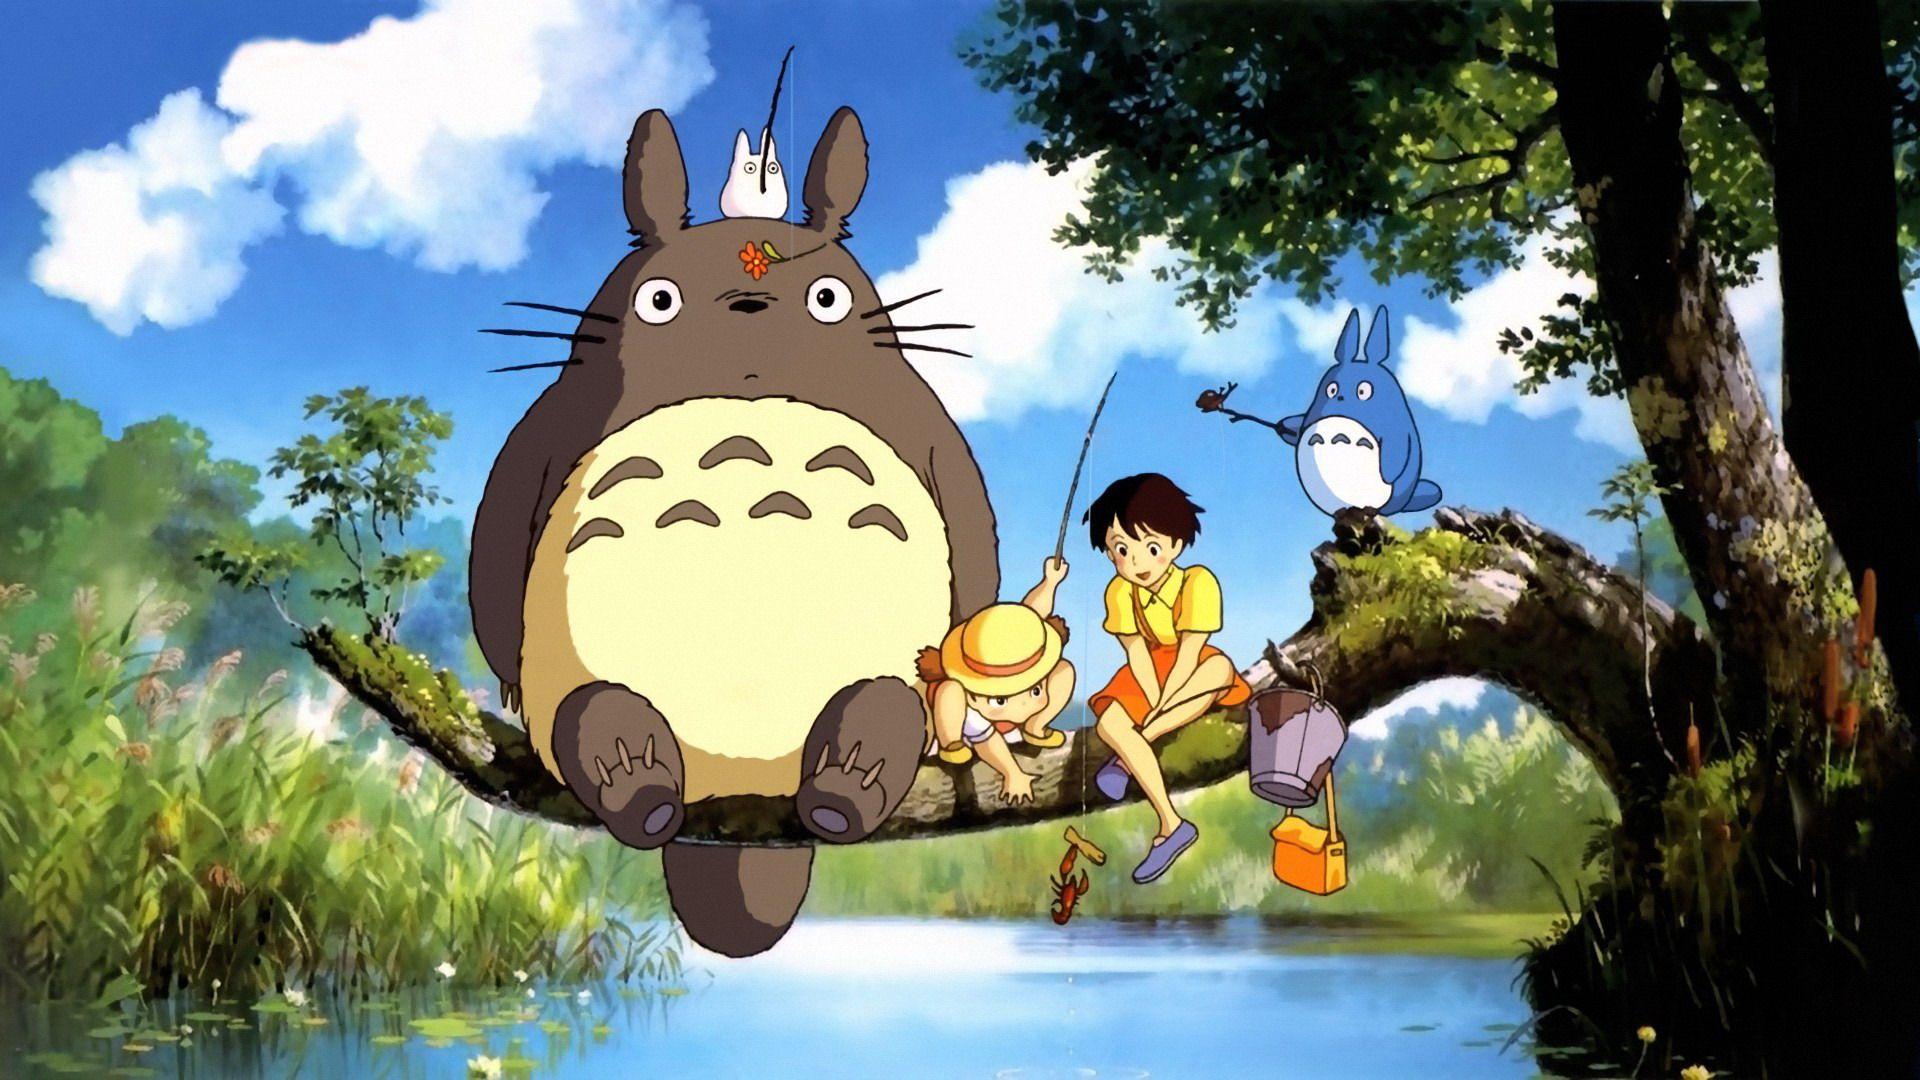 (Image: 'My Neighbor Totoro'Studio Ghibli)